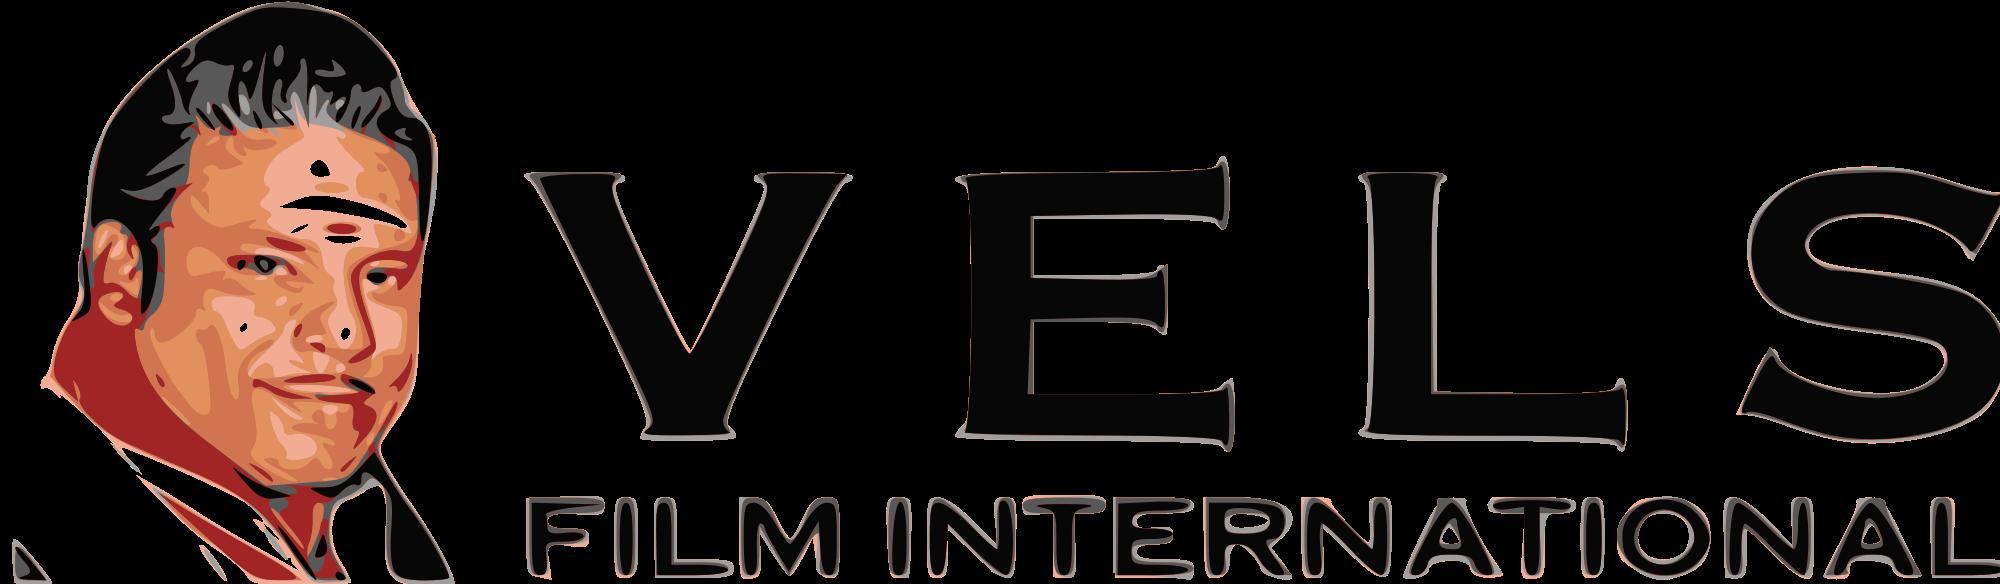 Vels Film International